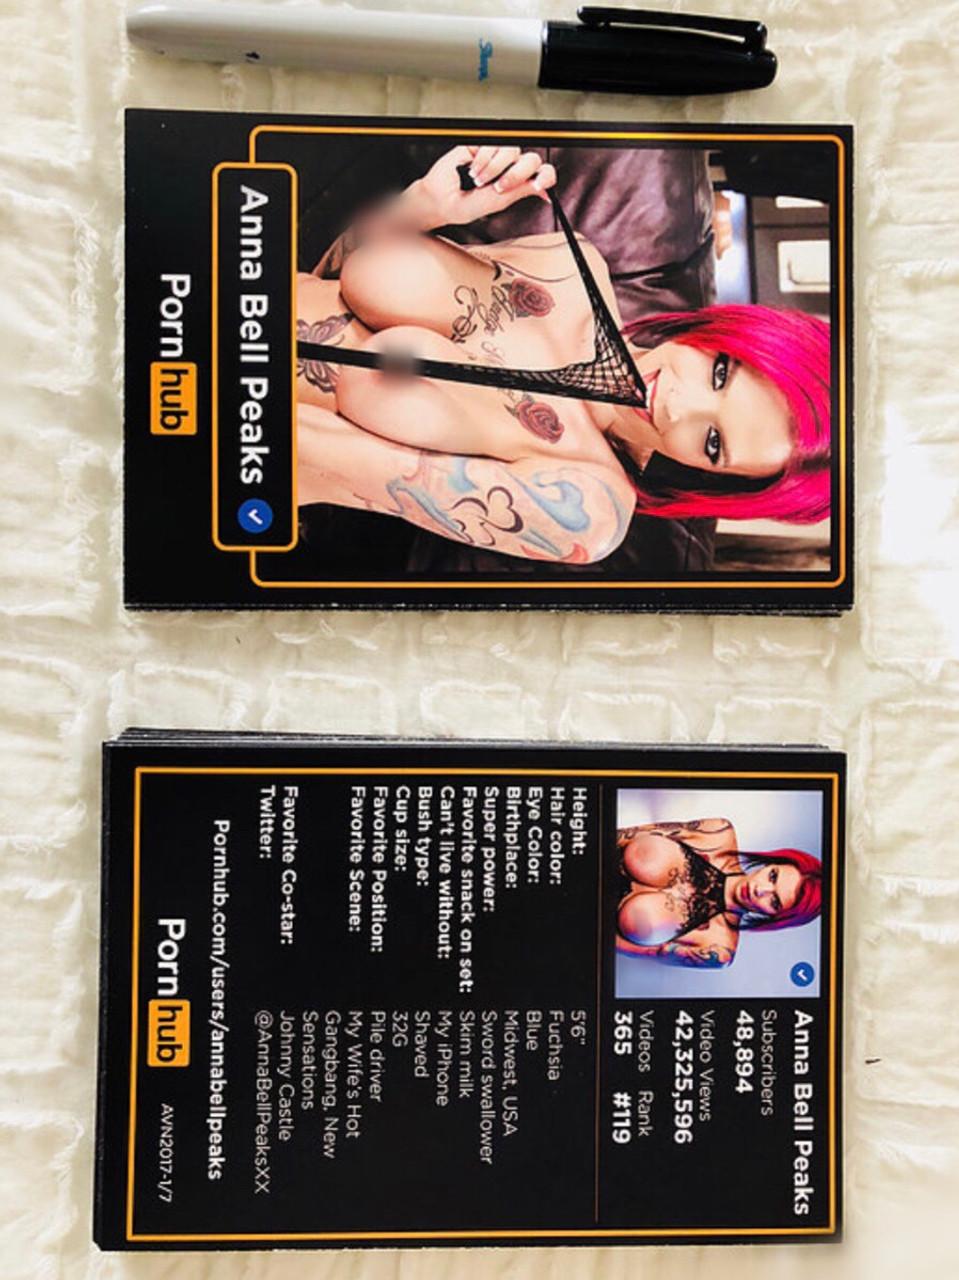 New Sensations Porn Hub limited edition trading card